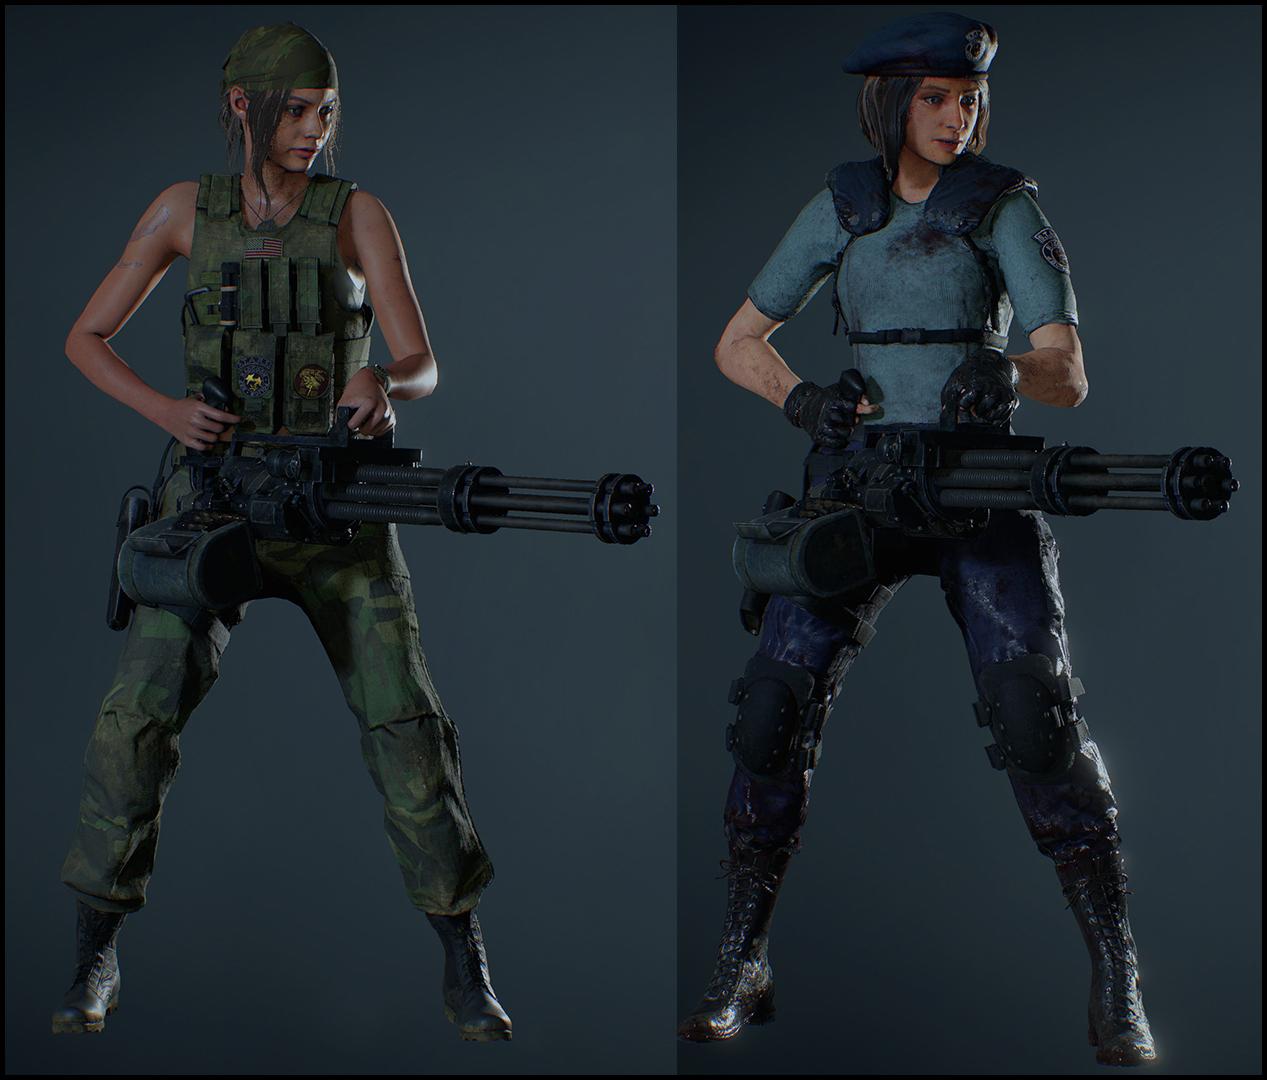 Jill Valentine 2 (Resident Evil 3 Remake) by